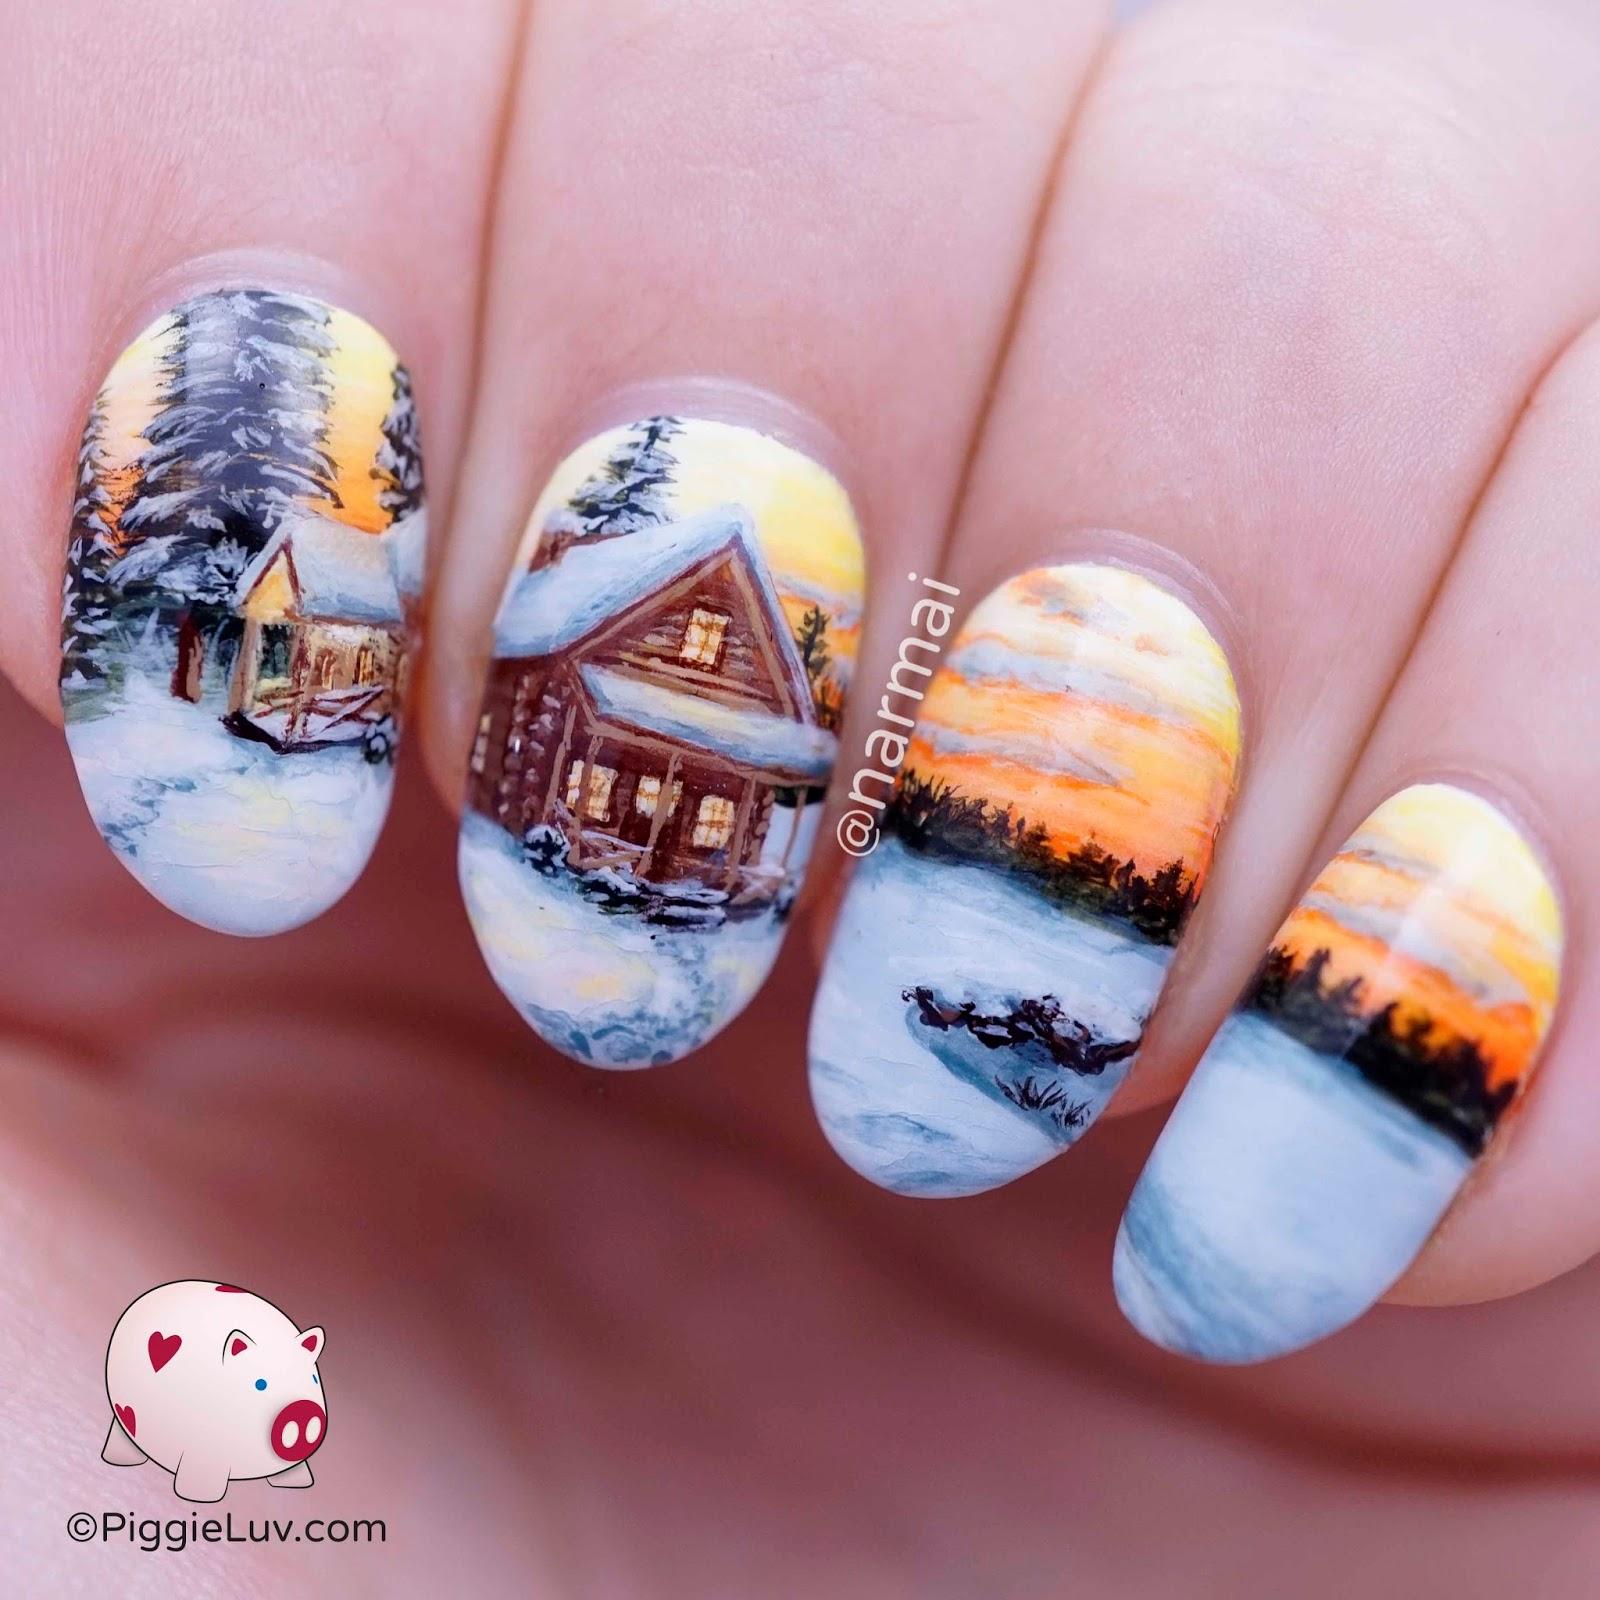 PiggieLuv: Freehand winter cabin landscape nail art